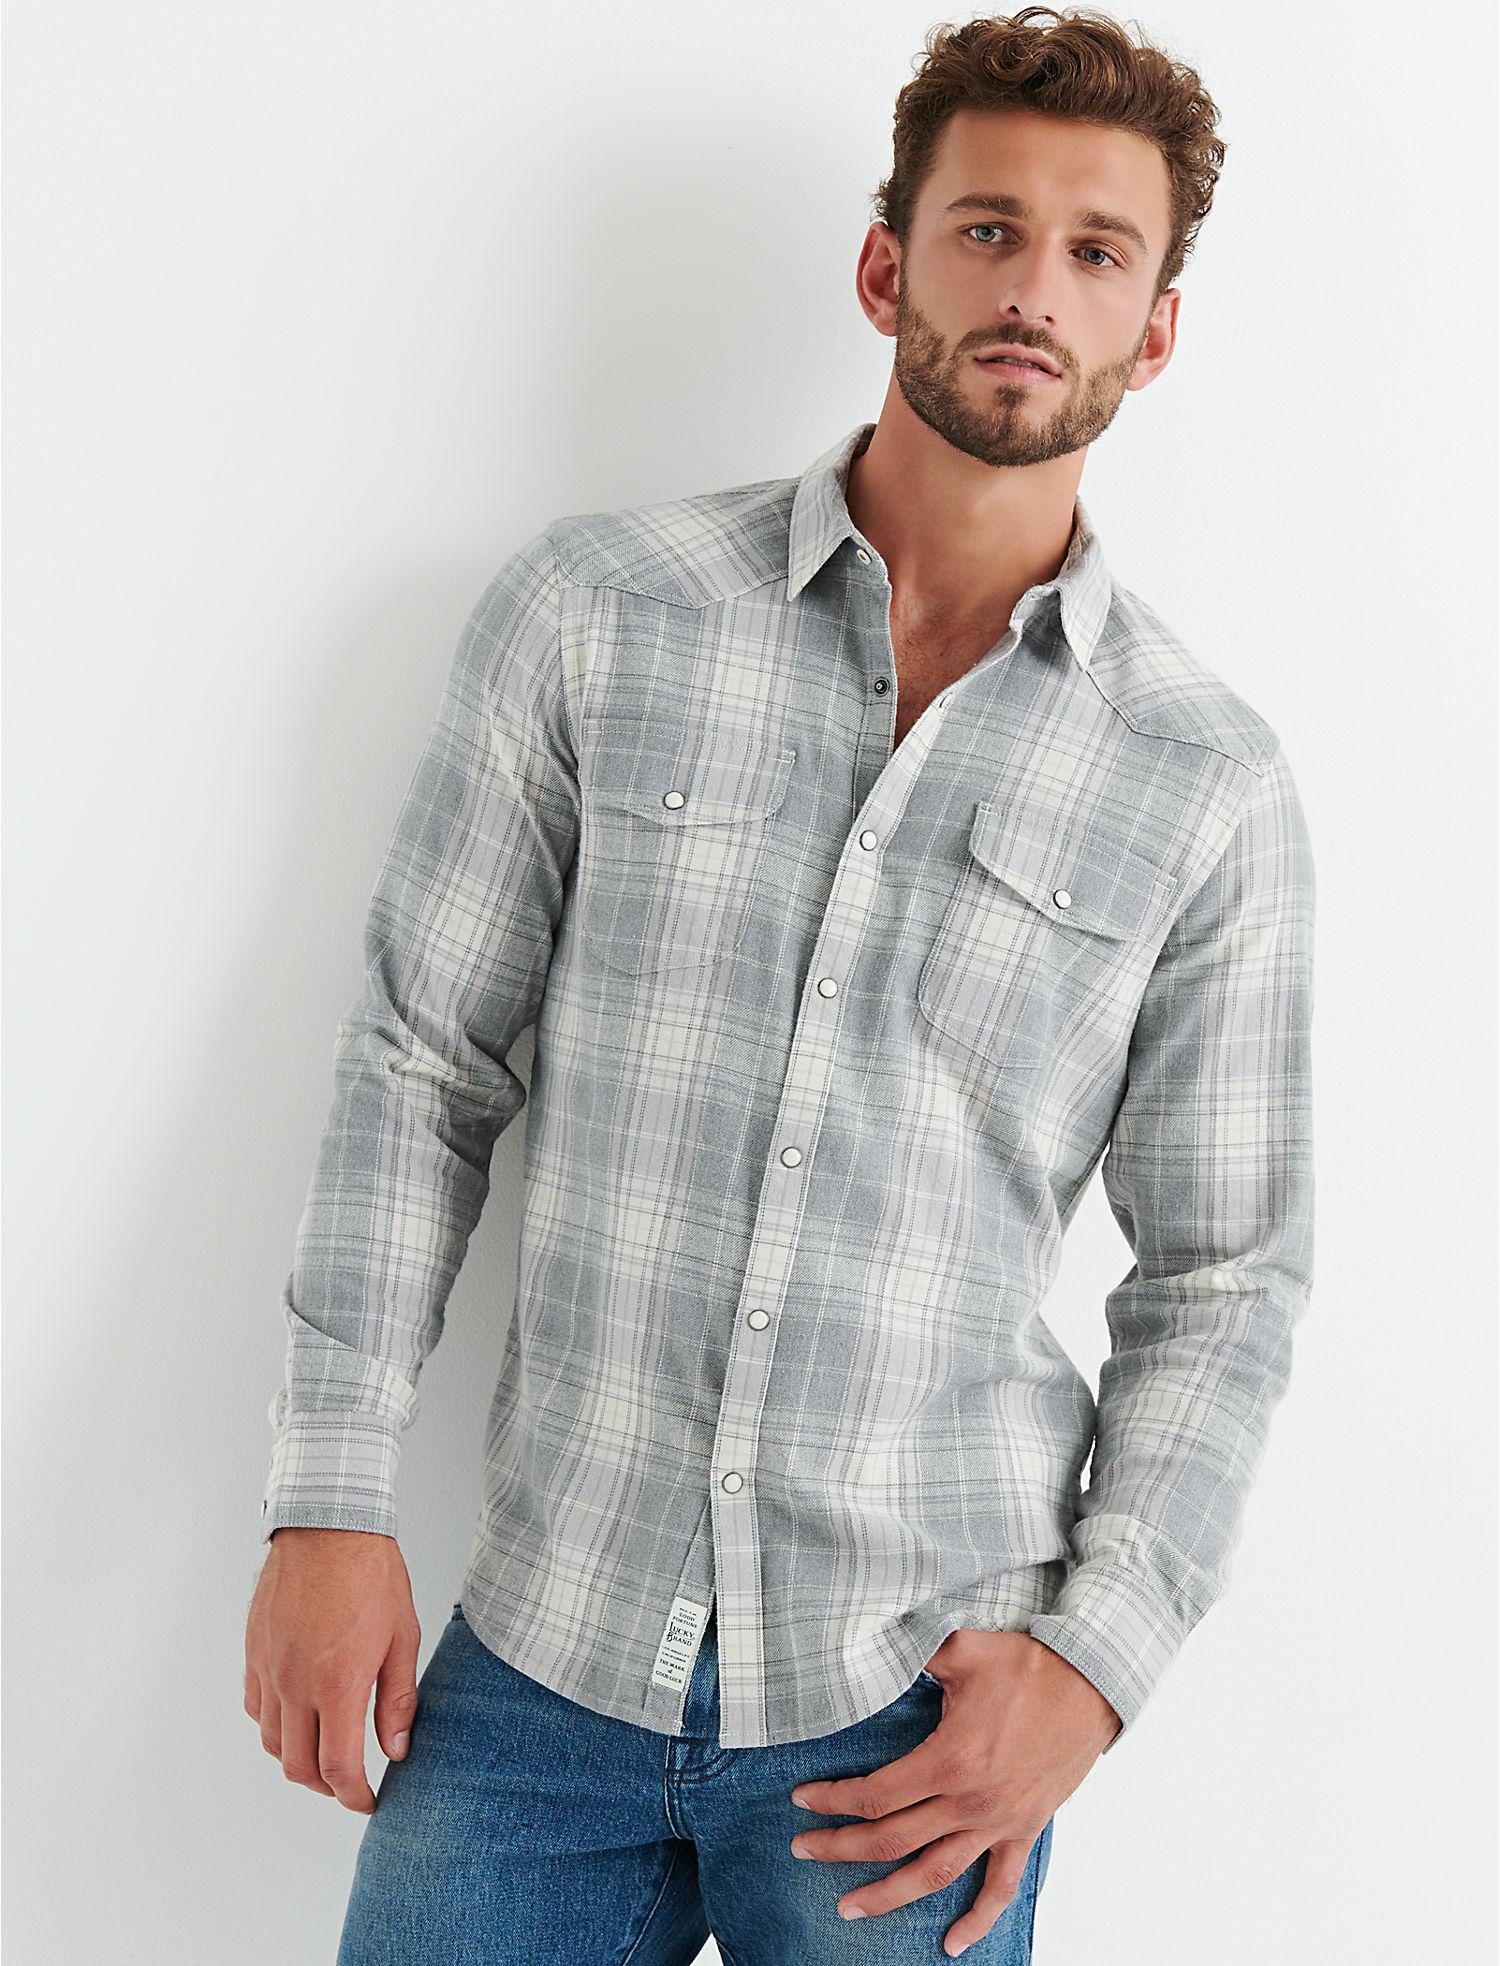 214fda2234 Santa Fe Long Sleeve Western Shirt